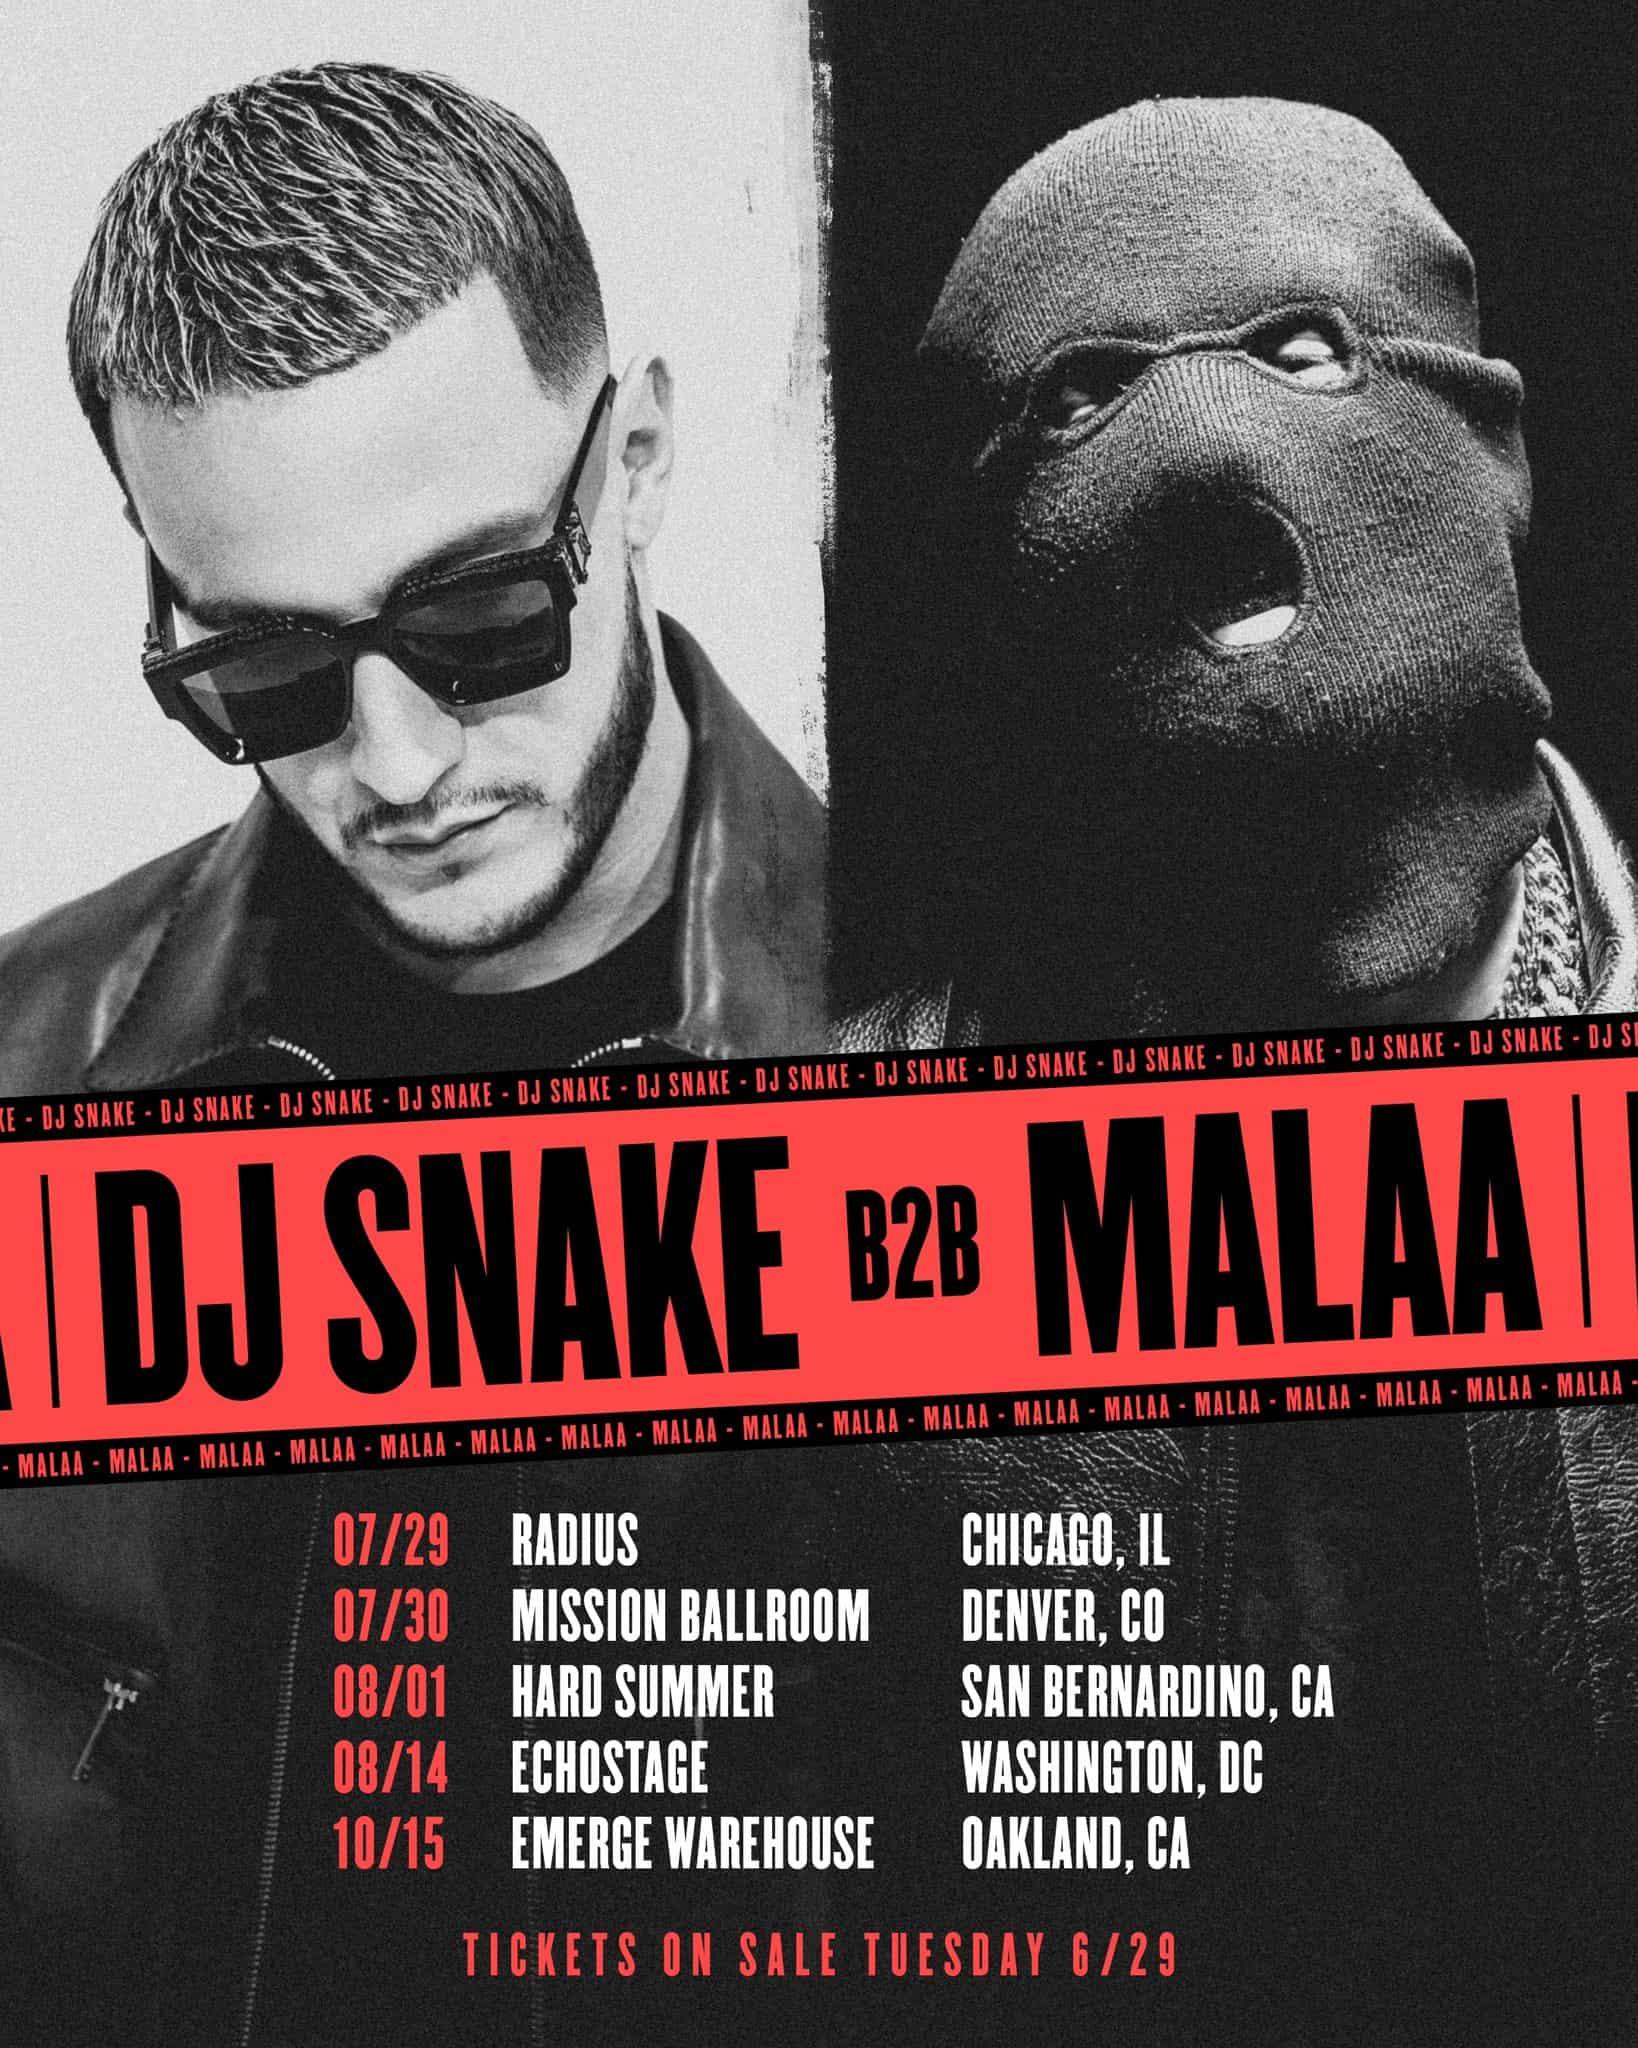 DJ Snake and Malaa to go B2B on a short North American Tour